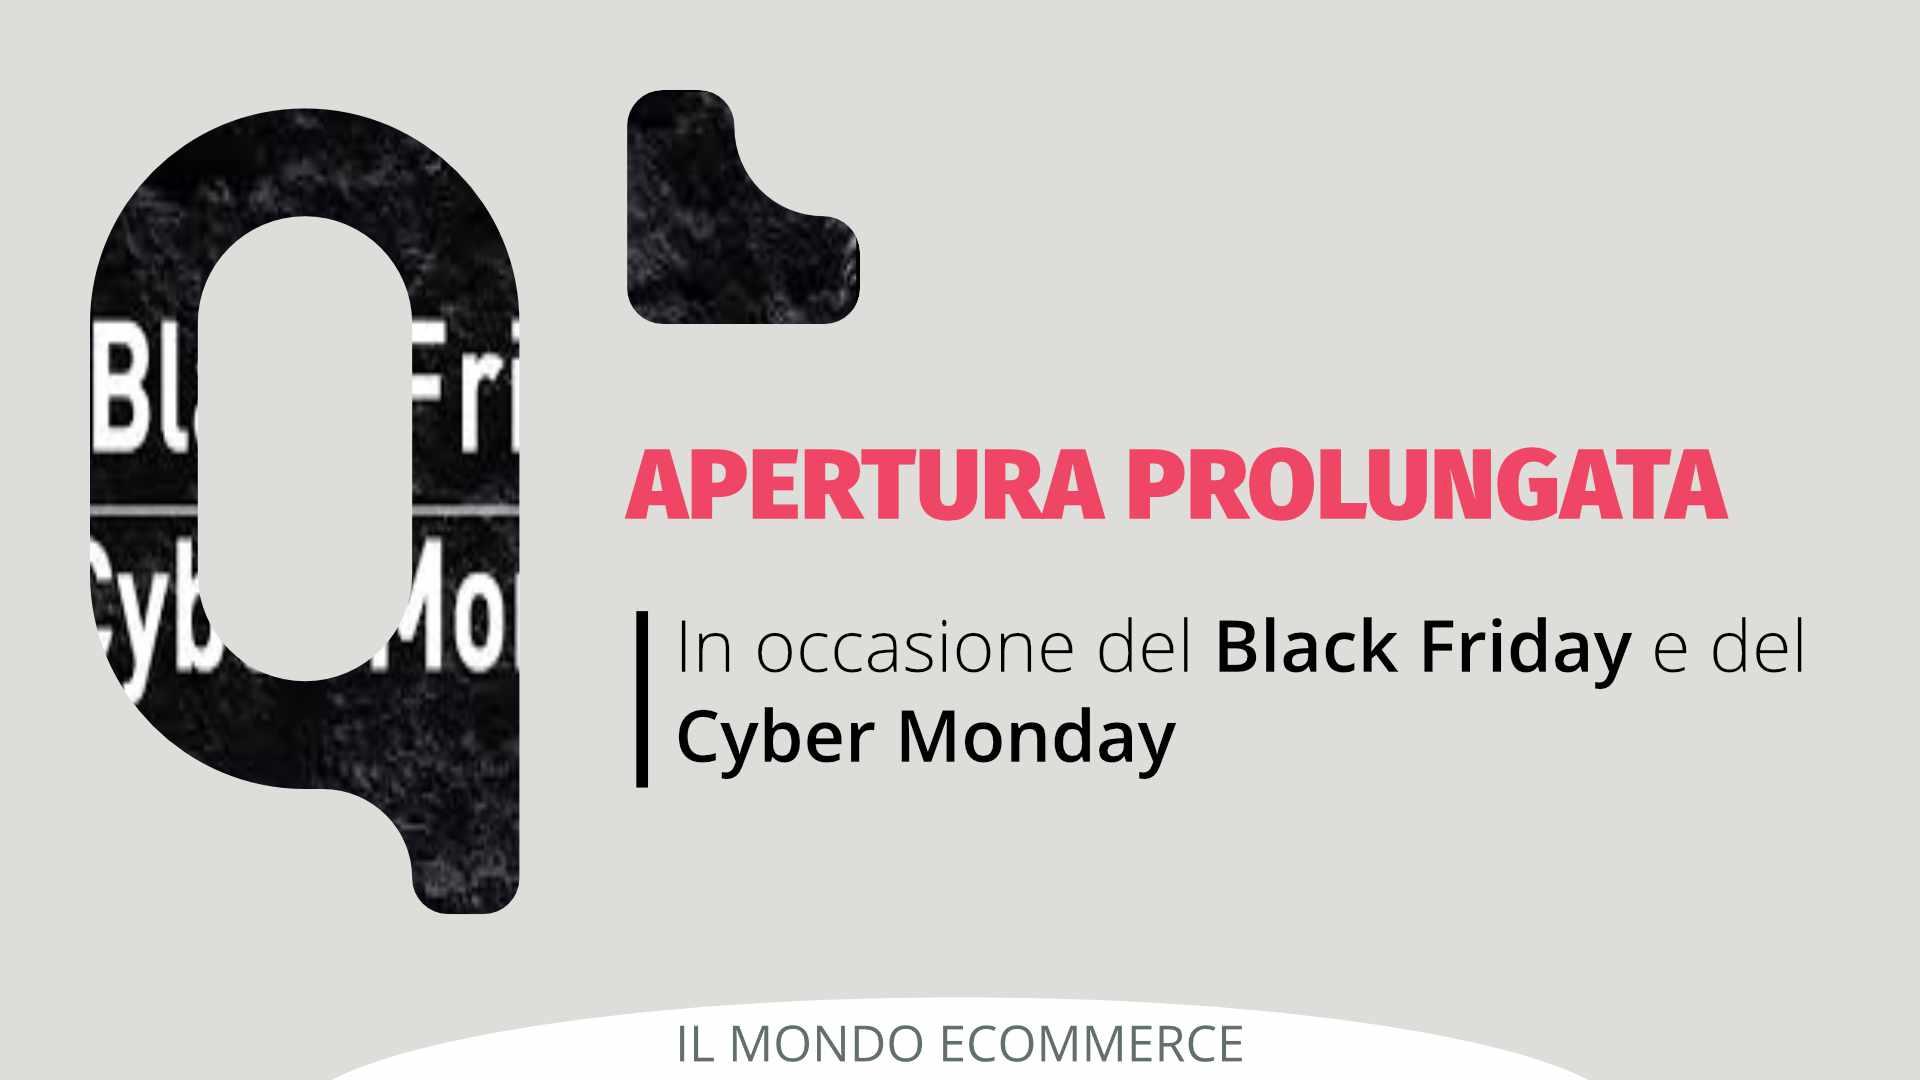 AVVISO: Apertura Prolungata Qapla' per Black Friday e Cyber Monday